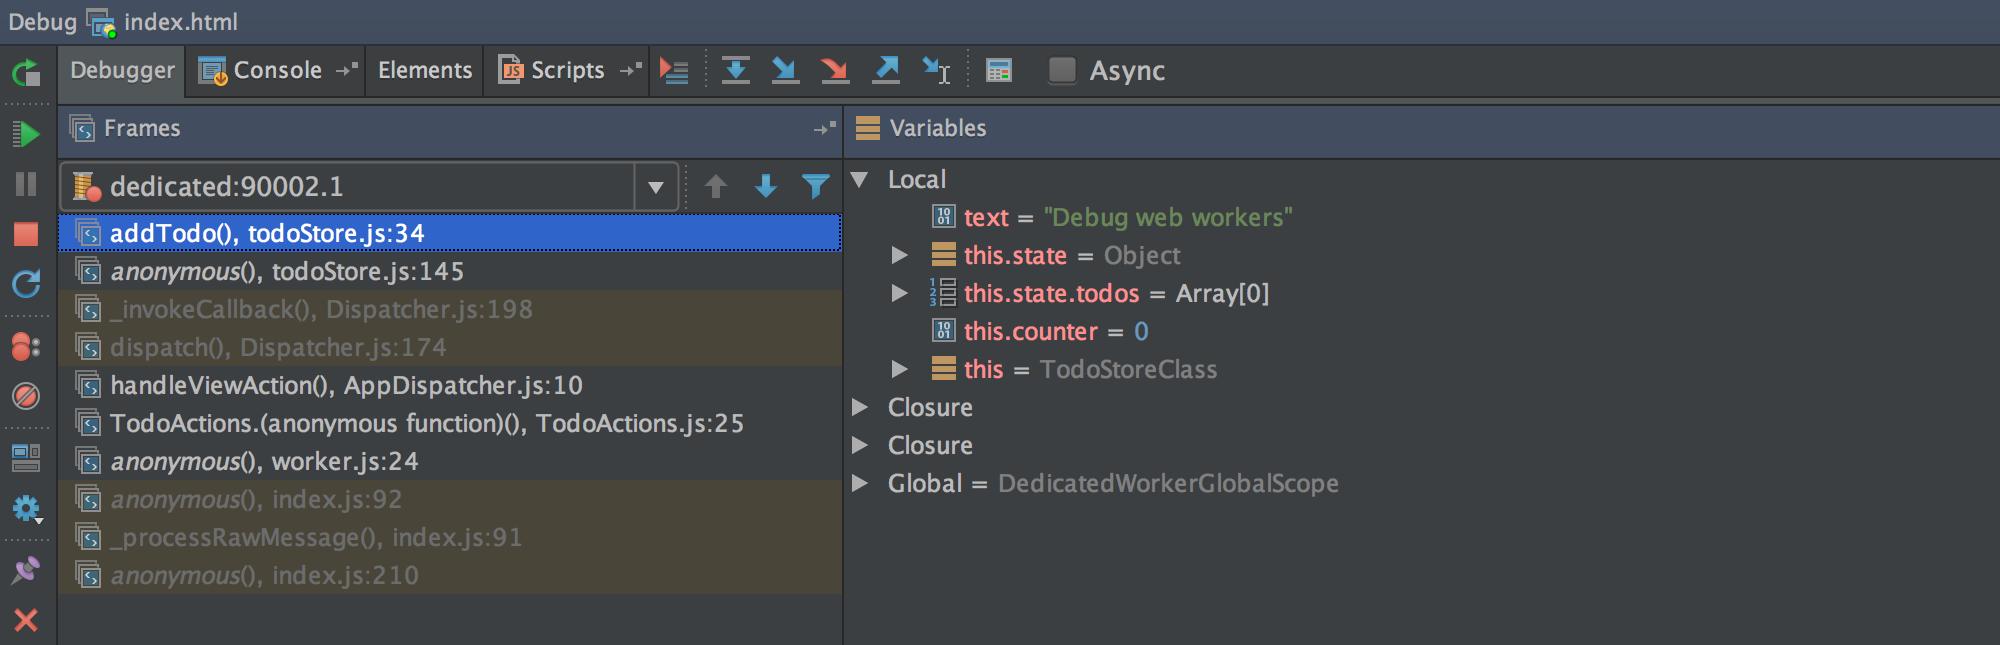 debug-web-workers